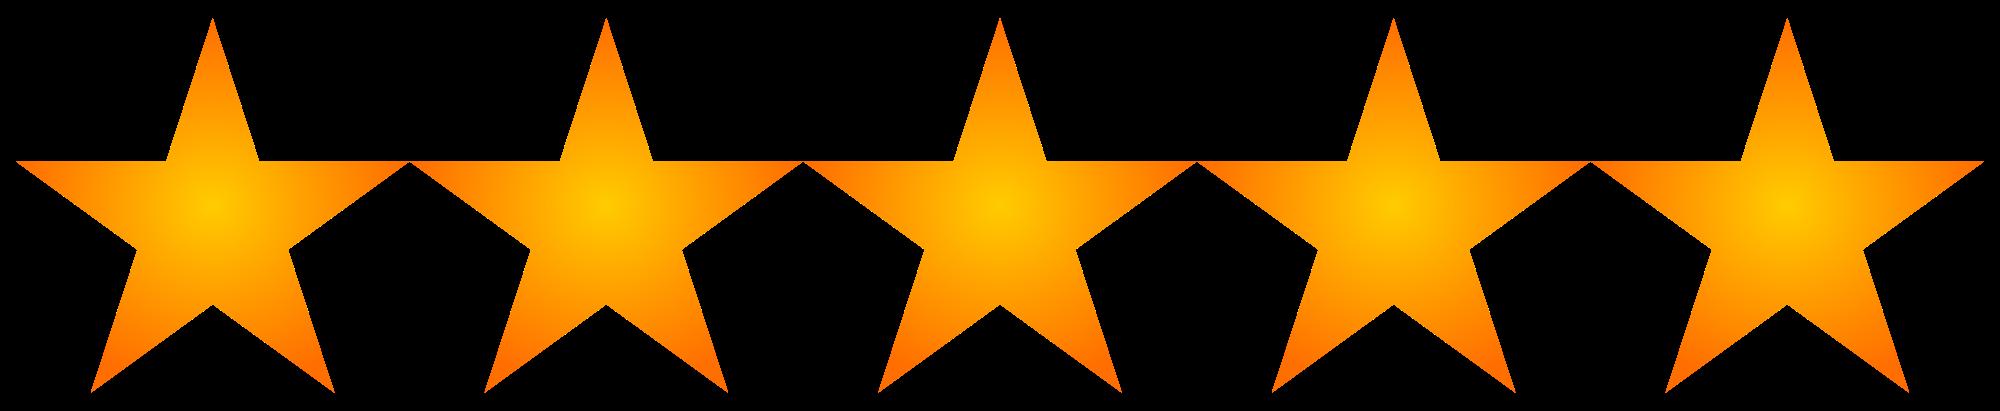 5_5_star